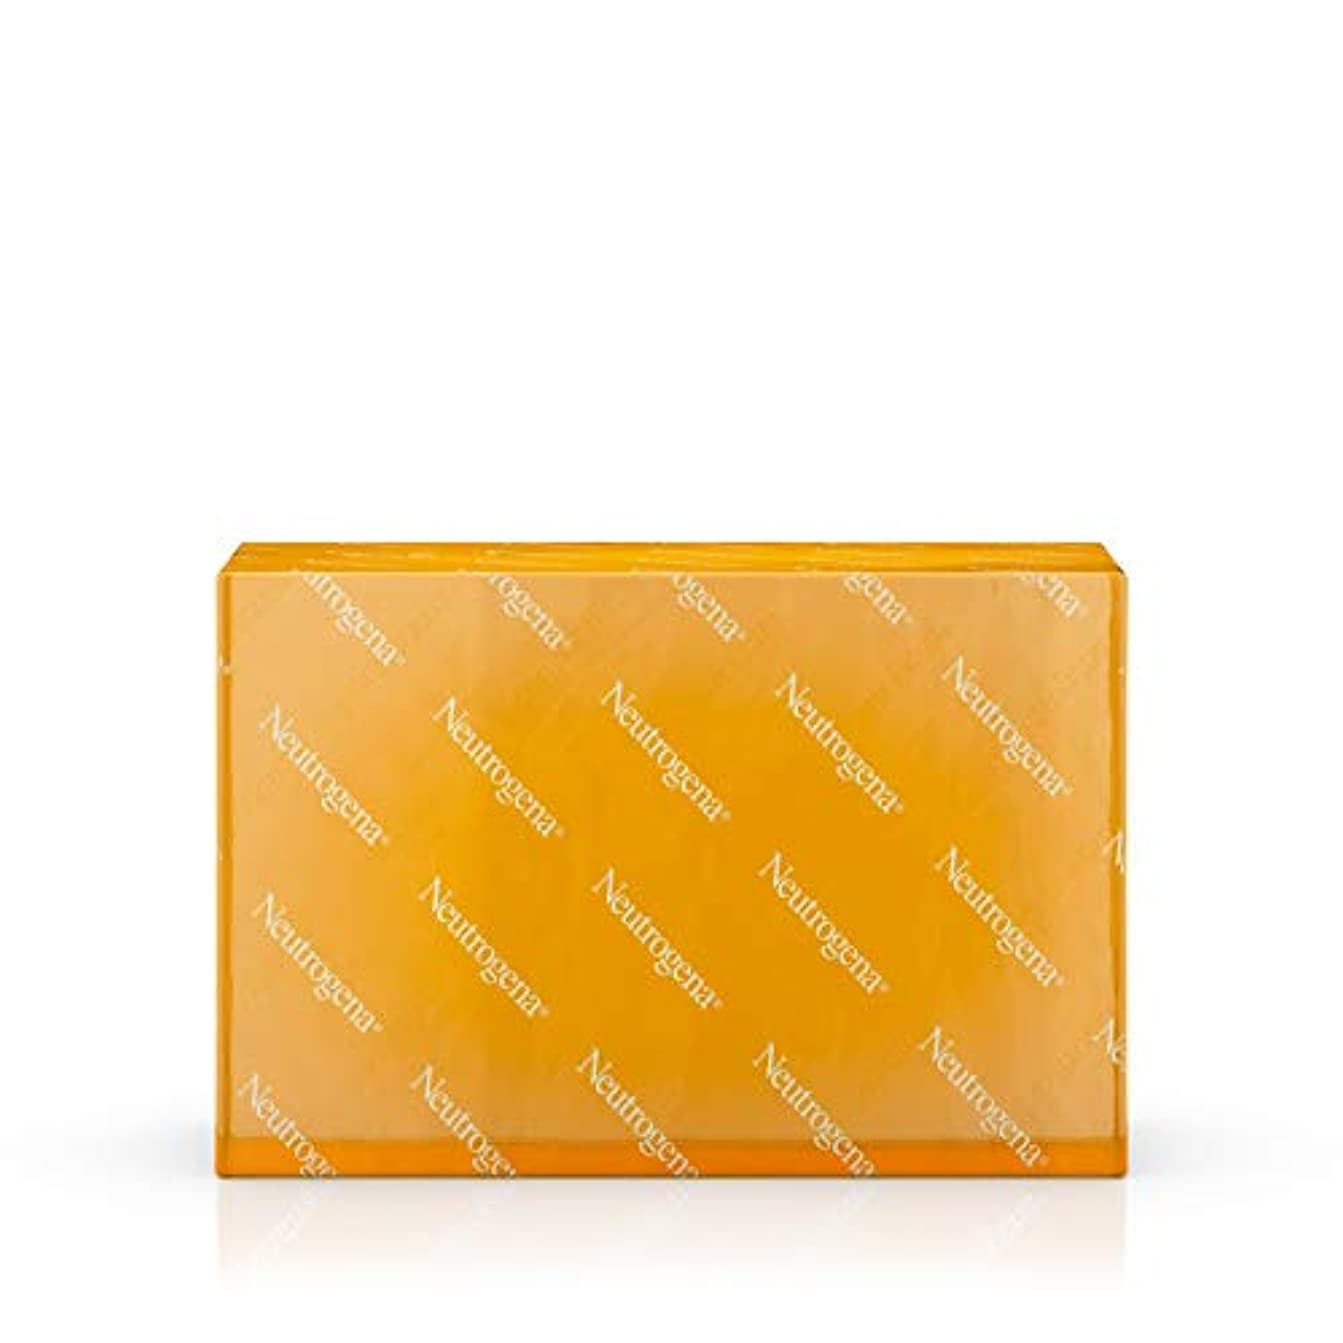 九時四十五分勝利ピアノ海外直送品 Neutrogena Neutrogena Transparent Facial Bar Soap Fragrance Free, Fragrance Free 3.5 oz